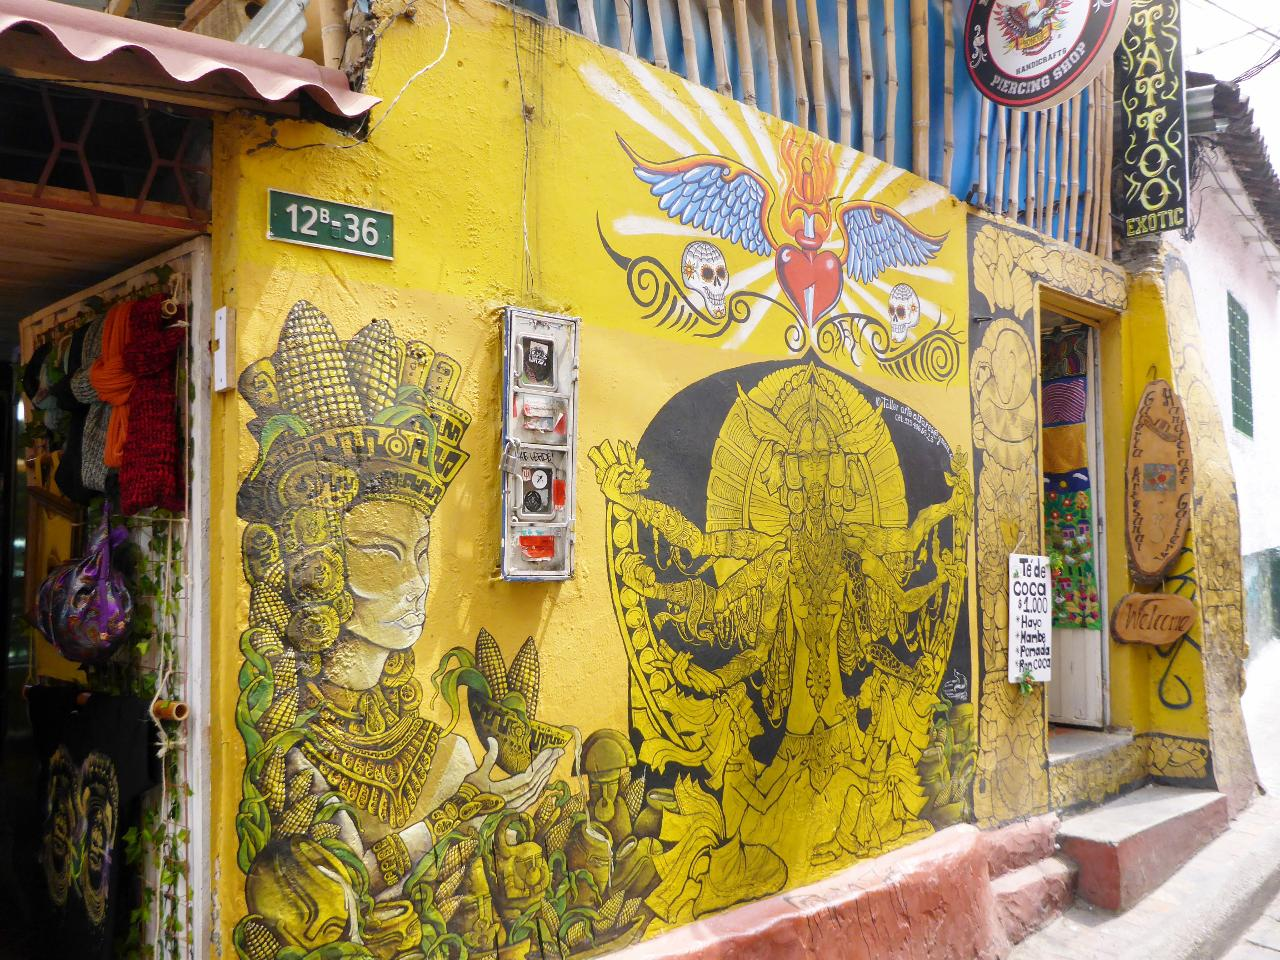 The graffiti in Bogota is beautiful.